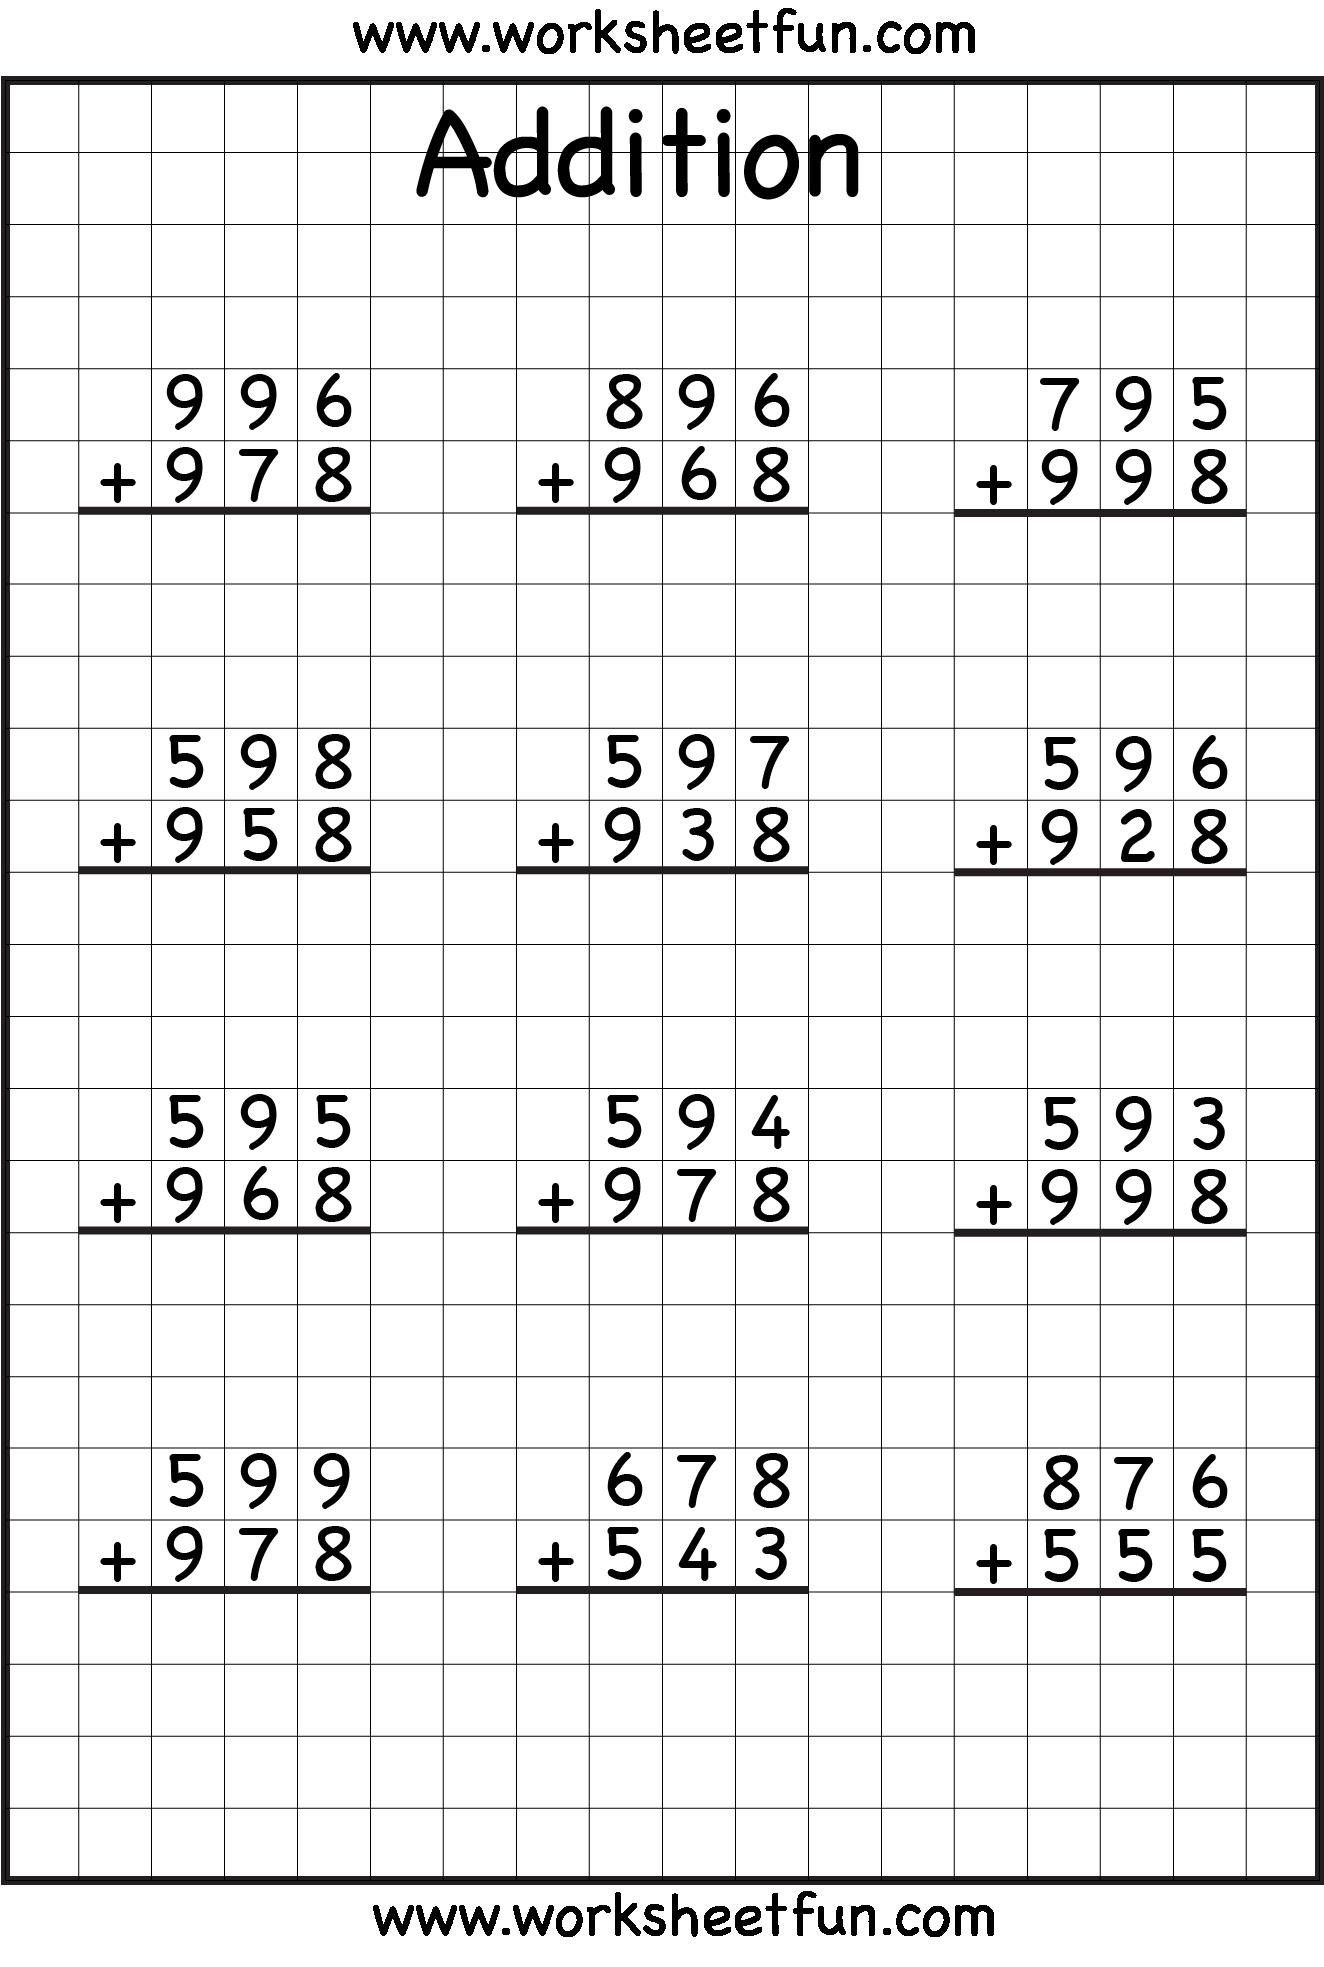 Addition Regrouping Math Math Worksheets 4th Grade Math Addition With Regrouping Worksheets Math Addition Worksheets 2nd Grade Math Worksheets